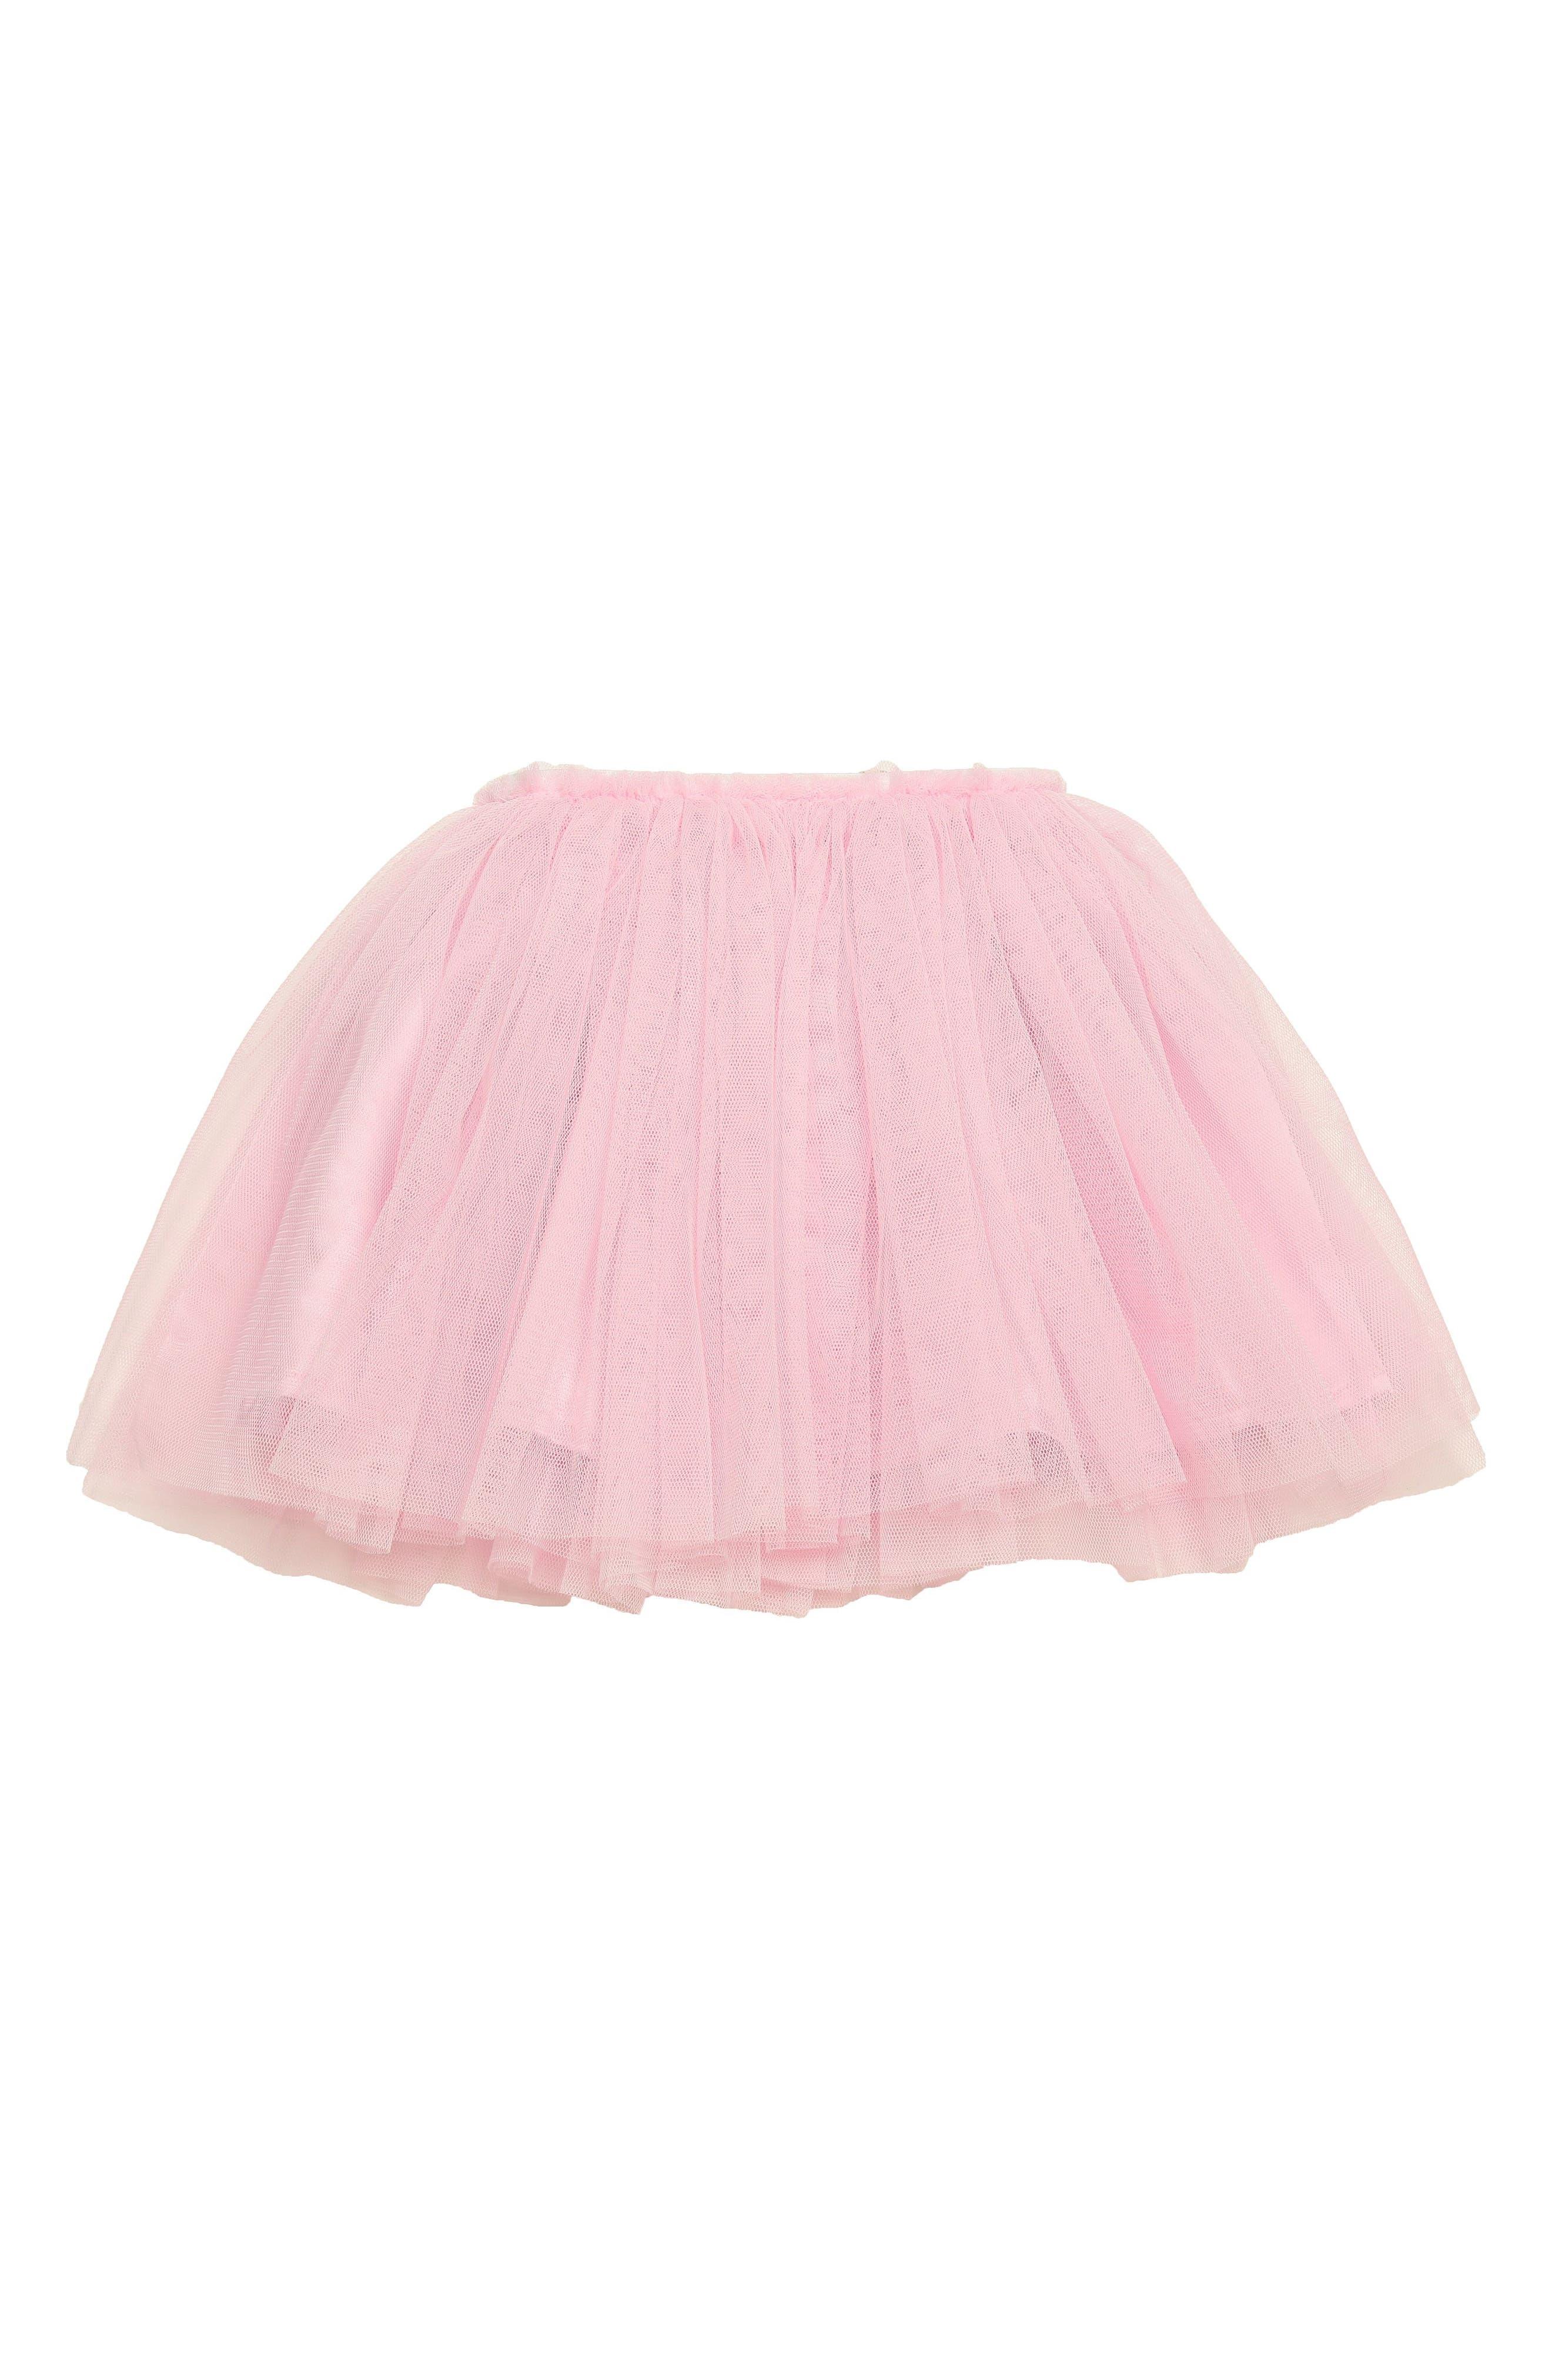 POPATU, Tutu Skirt, Main thumbnail 1, color, 680